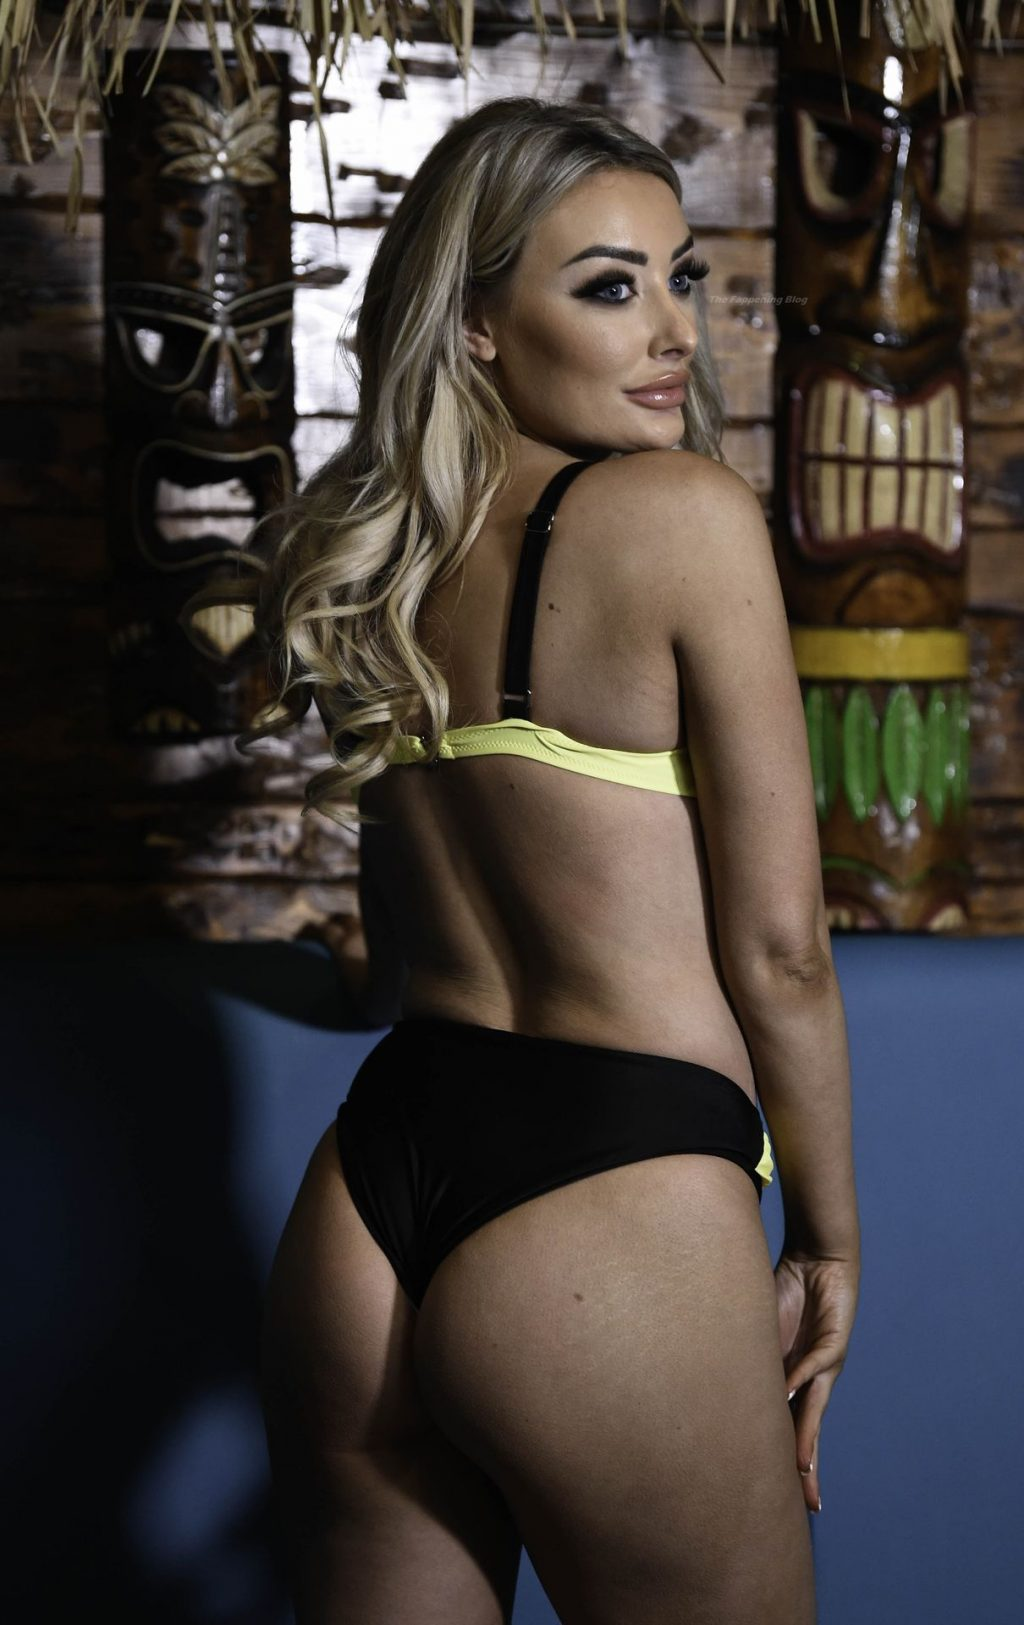 Chloe Crowhurst is Seen During a New Swimwear Shoot (8 Photos)